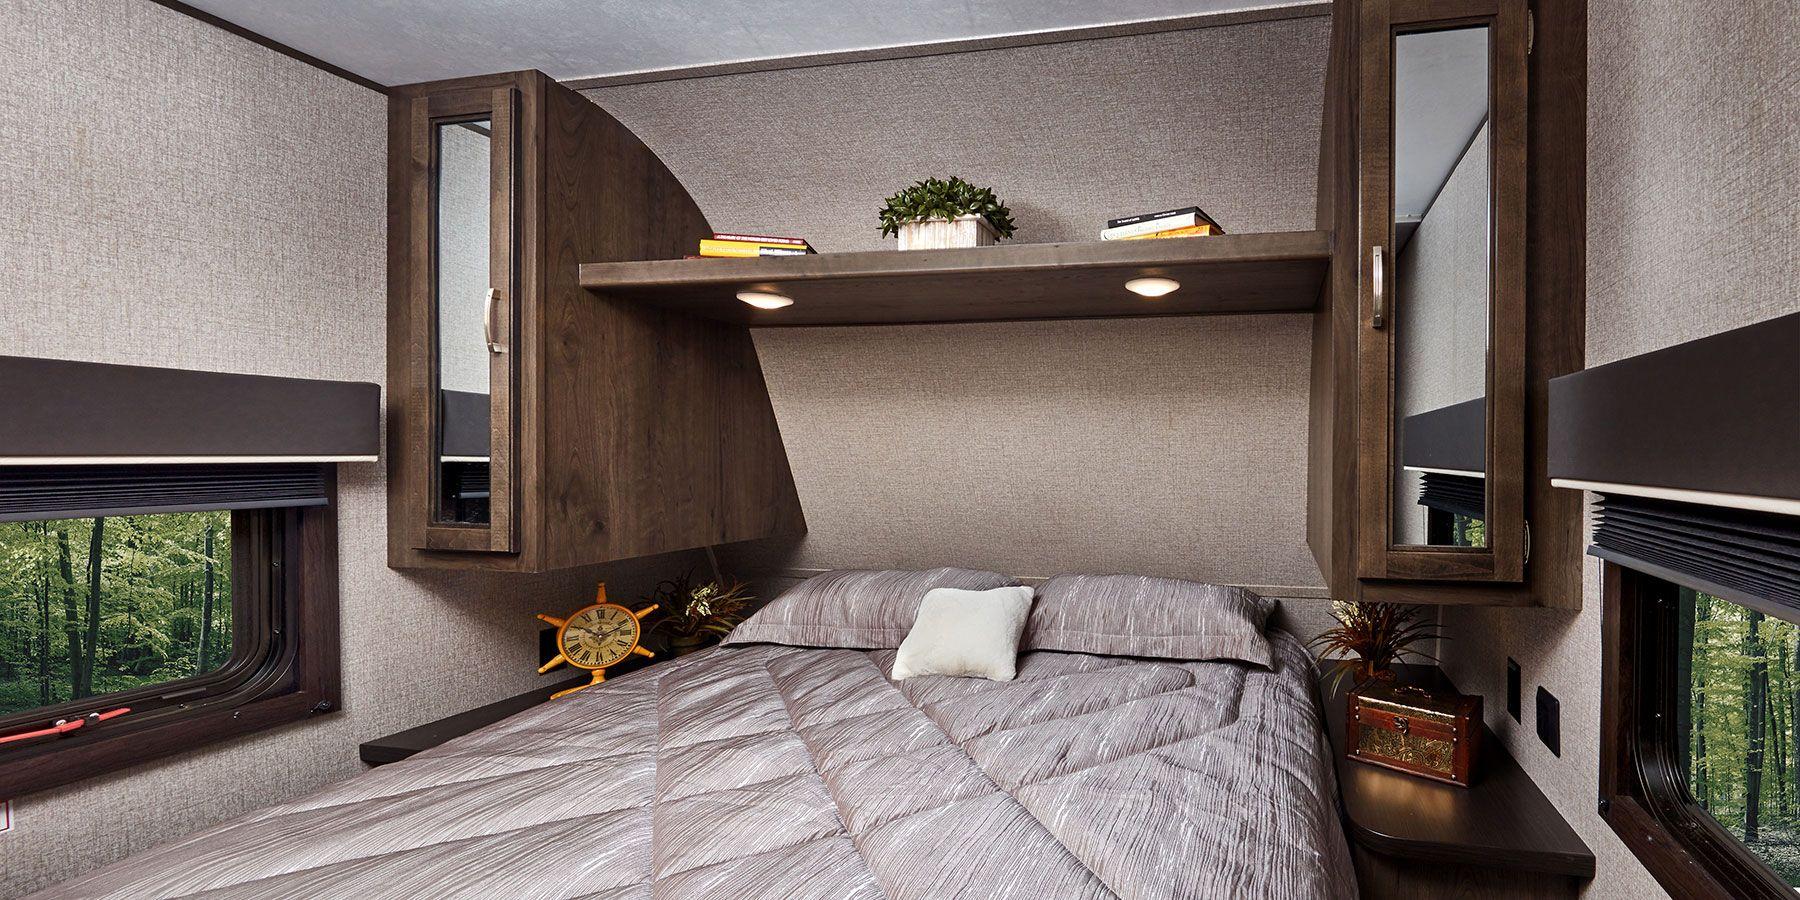 jayco jay flight bedroom